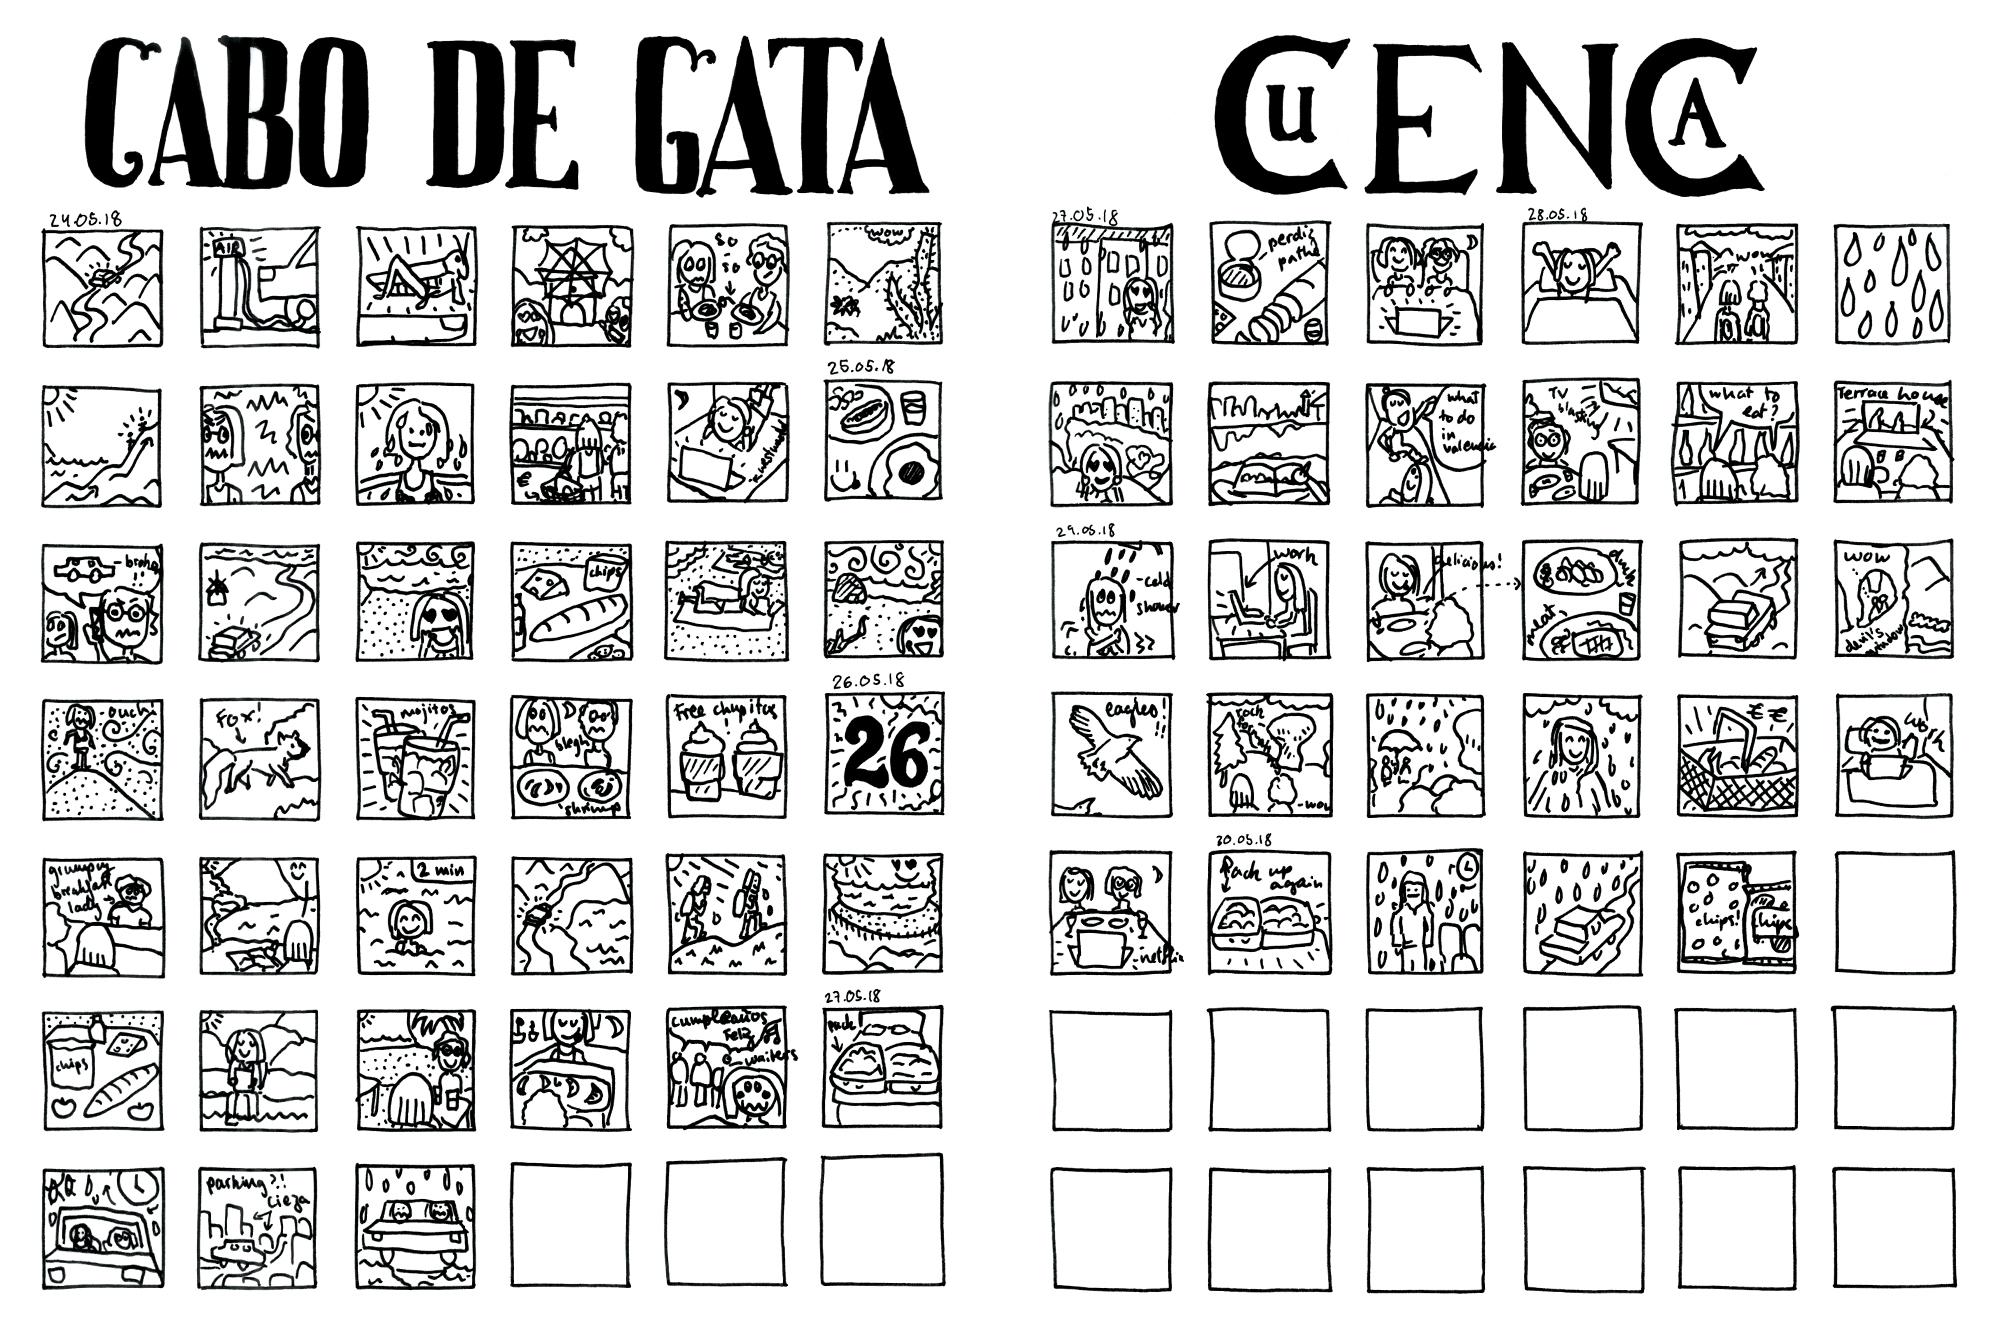 27_cabo-gata_cuenca_comic_web.jpg